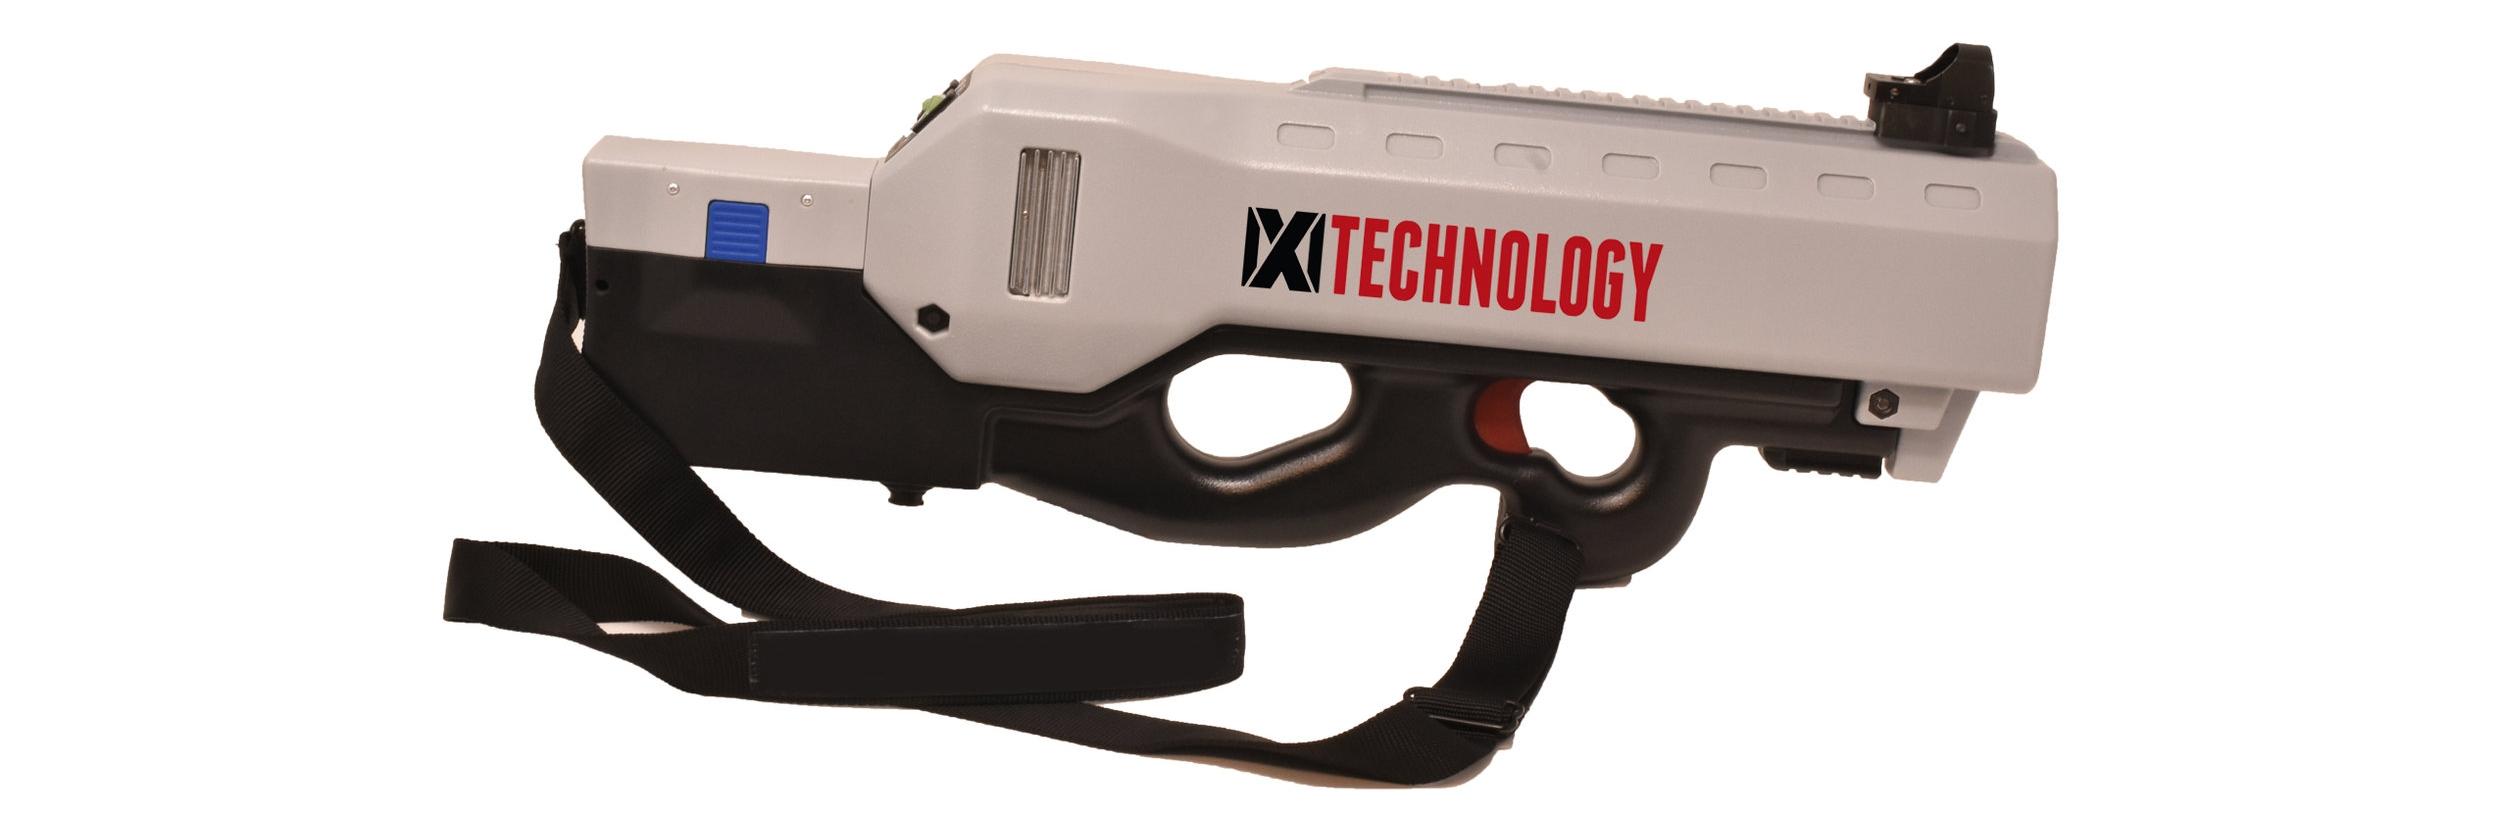 dronekiller gun with logo.jpg